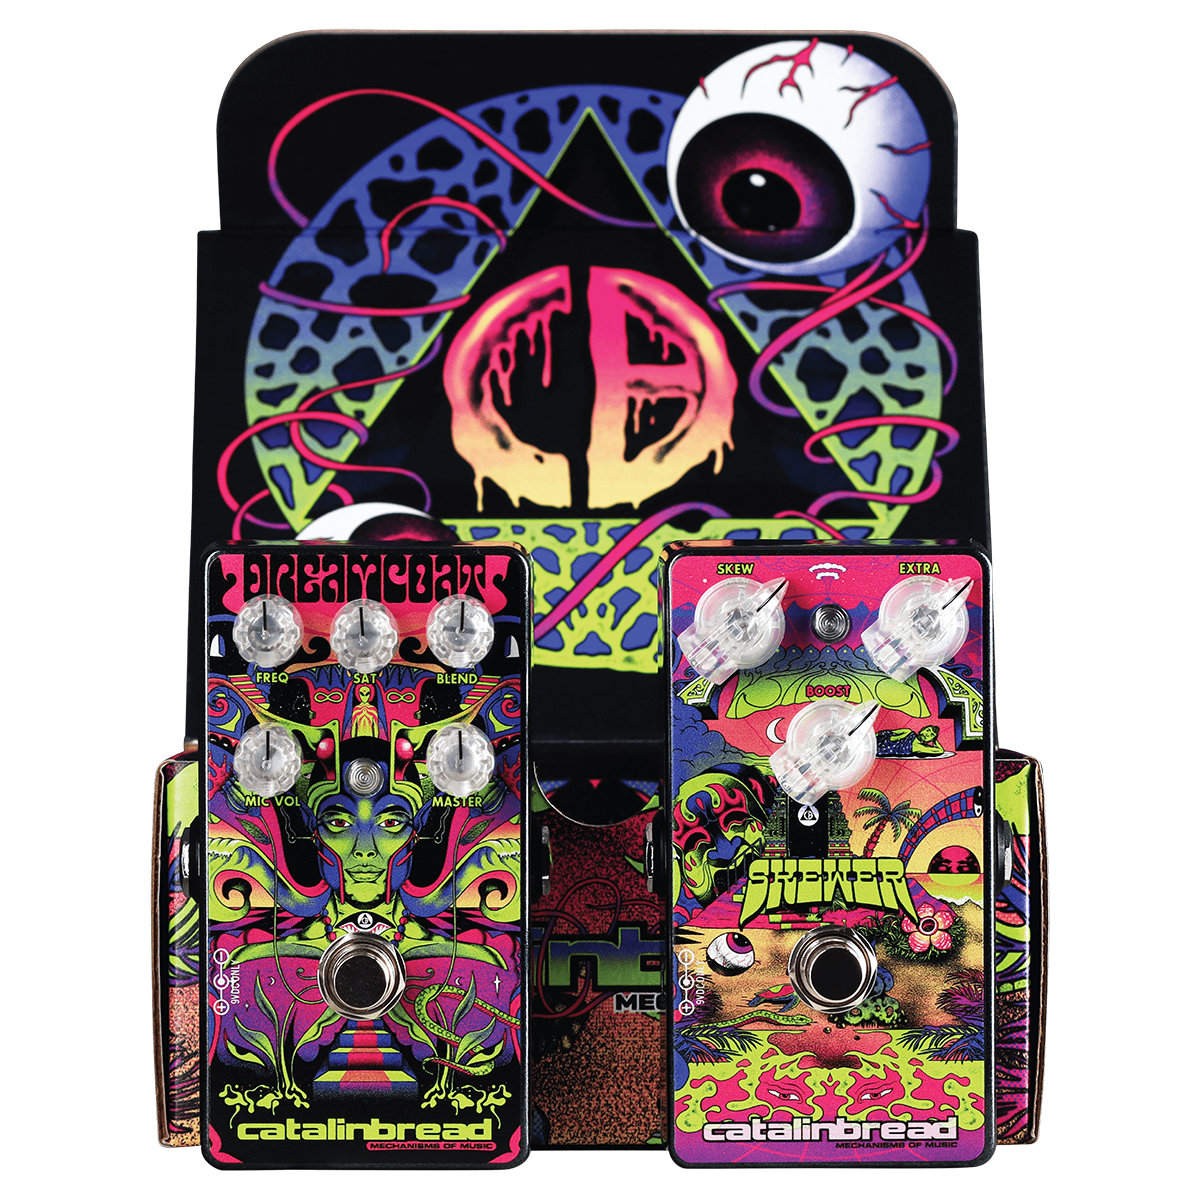 Catalinbread Dreamcoat / Skewer BOX SET Limited Edition